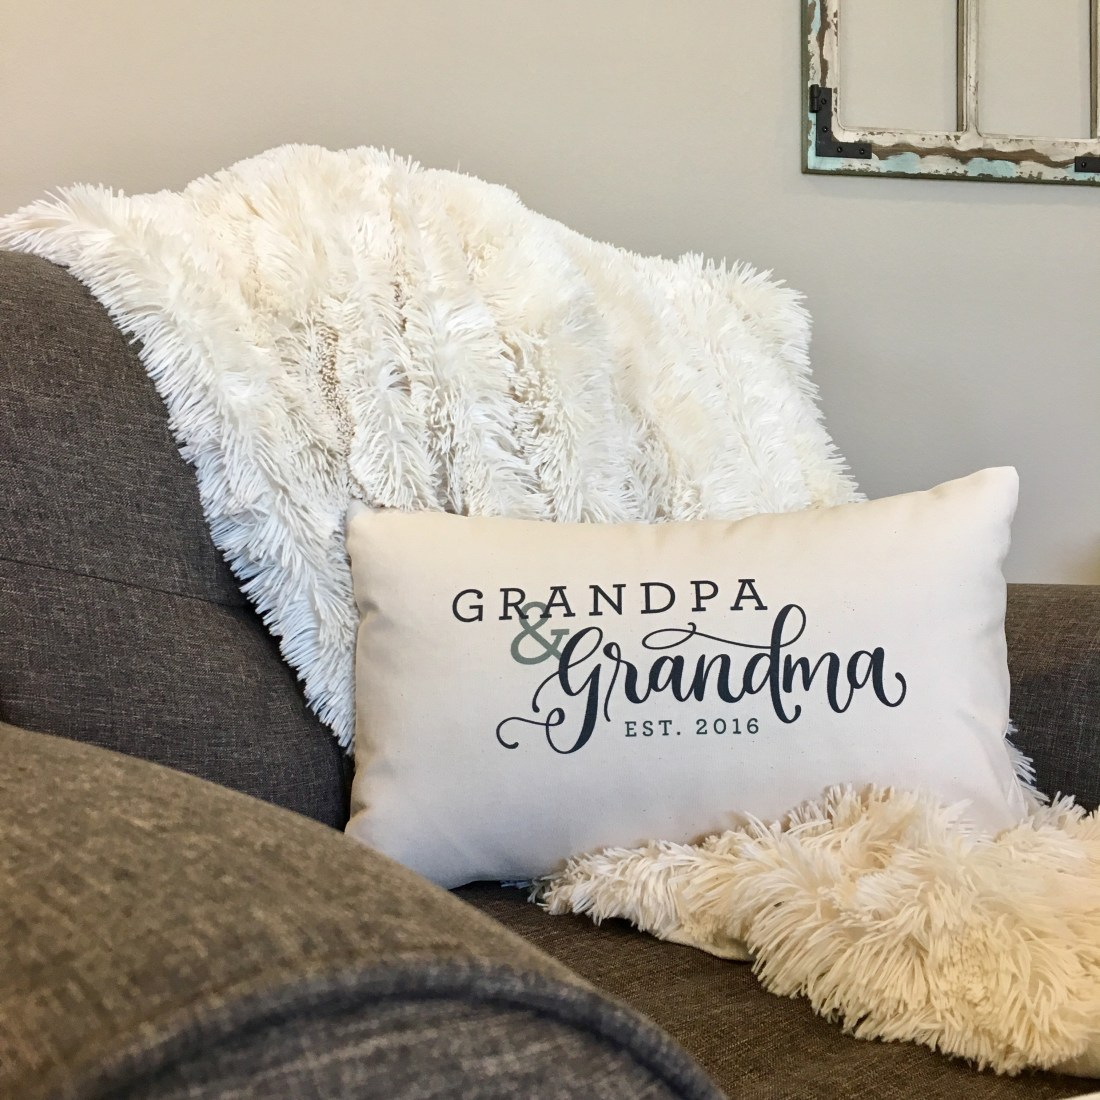 Sam Allen Creates Grandpa and Grandma Pillow Designs, Printed and Produced by Hen House Originals